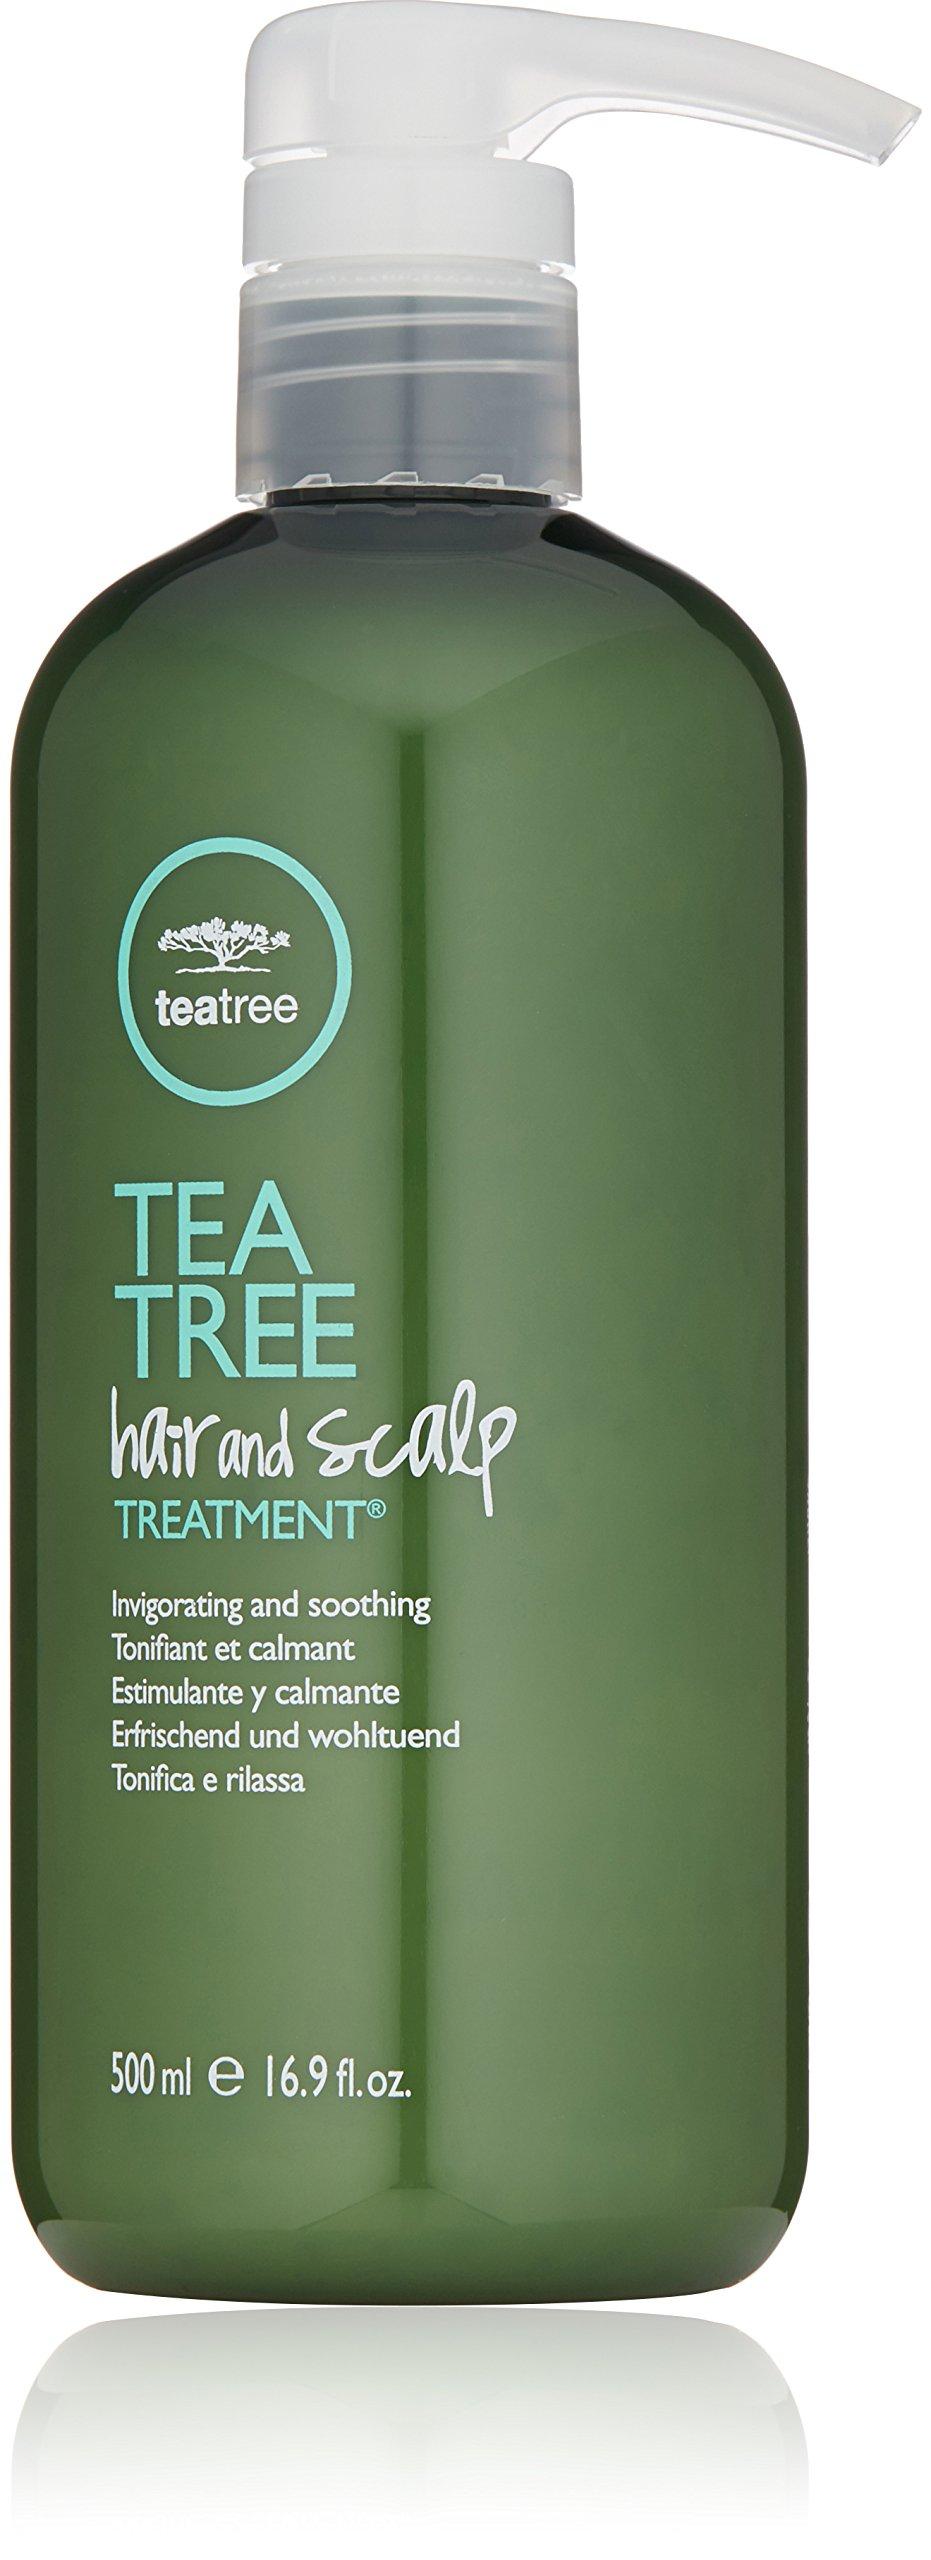 Tea Tree Hair and Scalp Treatment, 16.9 Fl Oz by Tea Tree